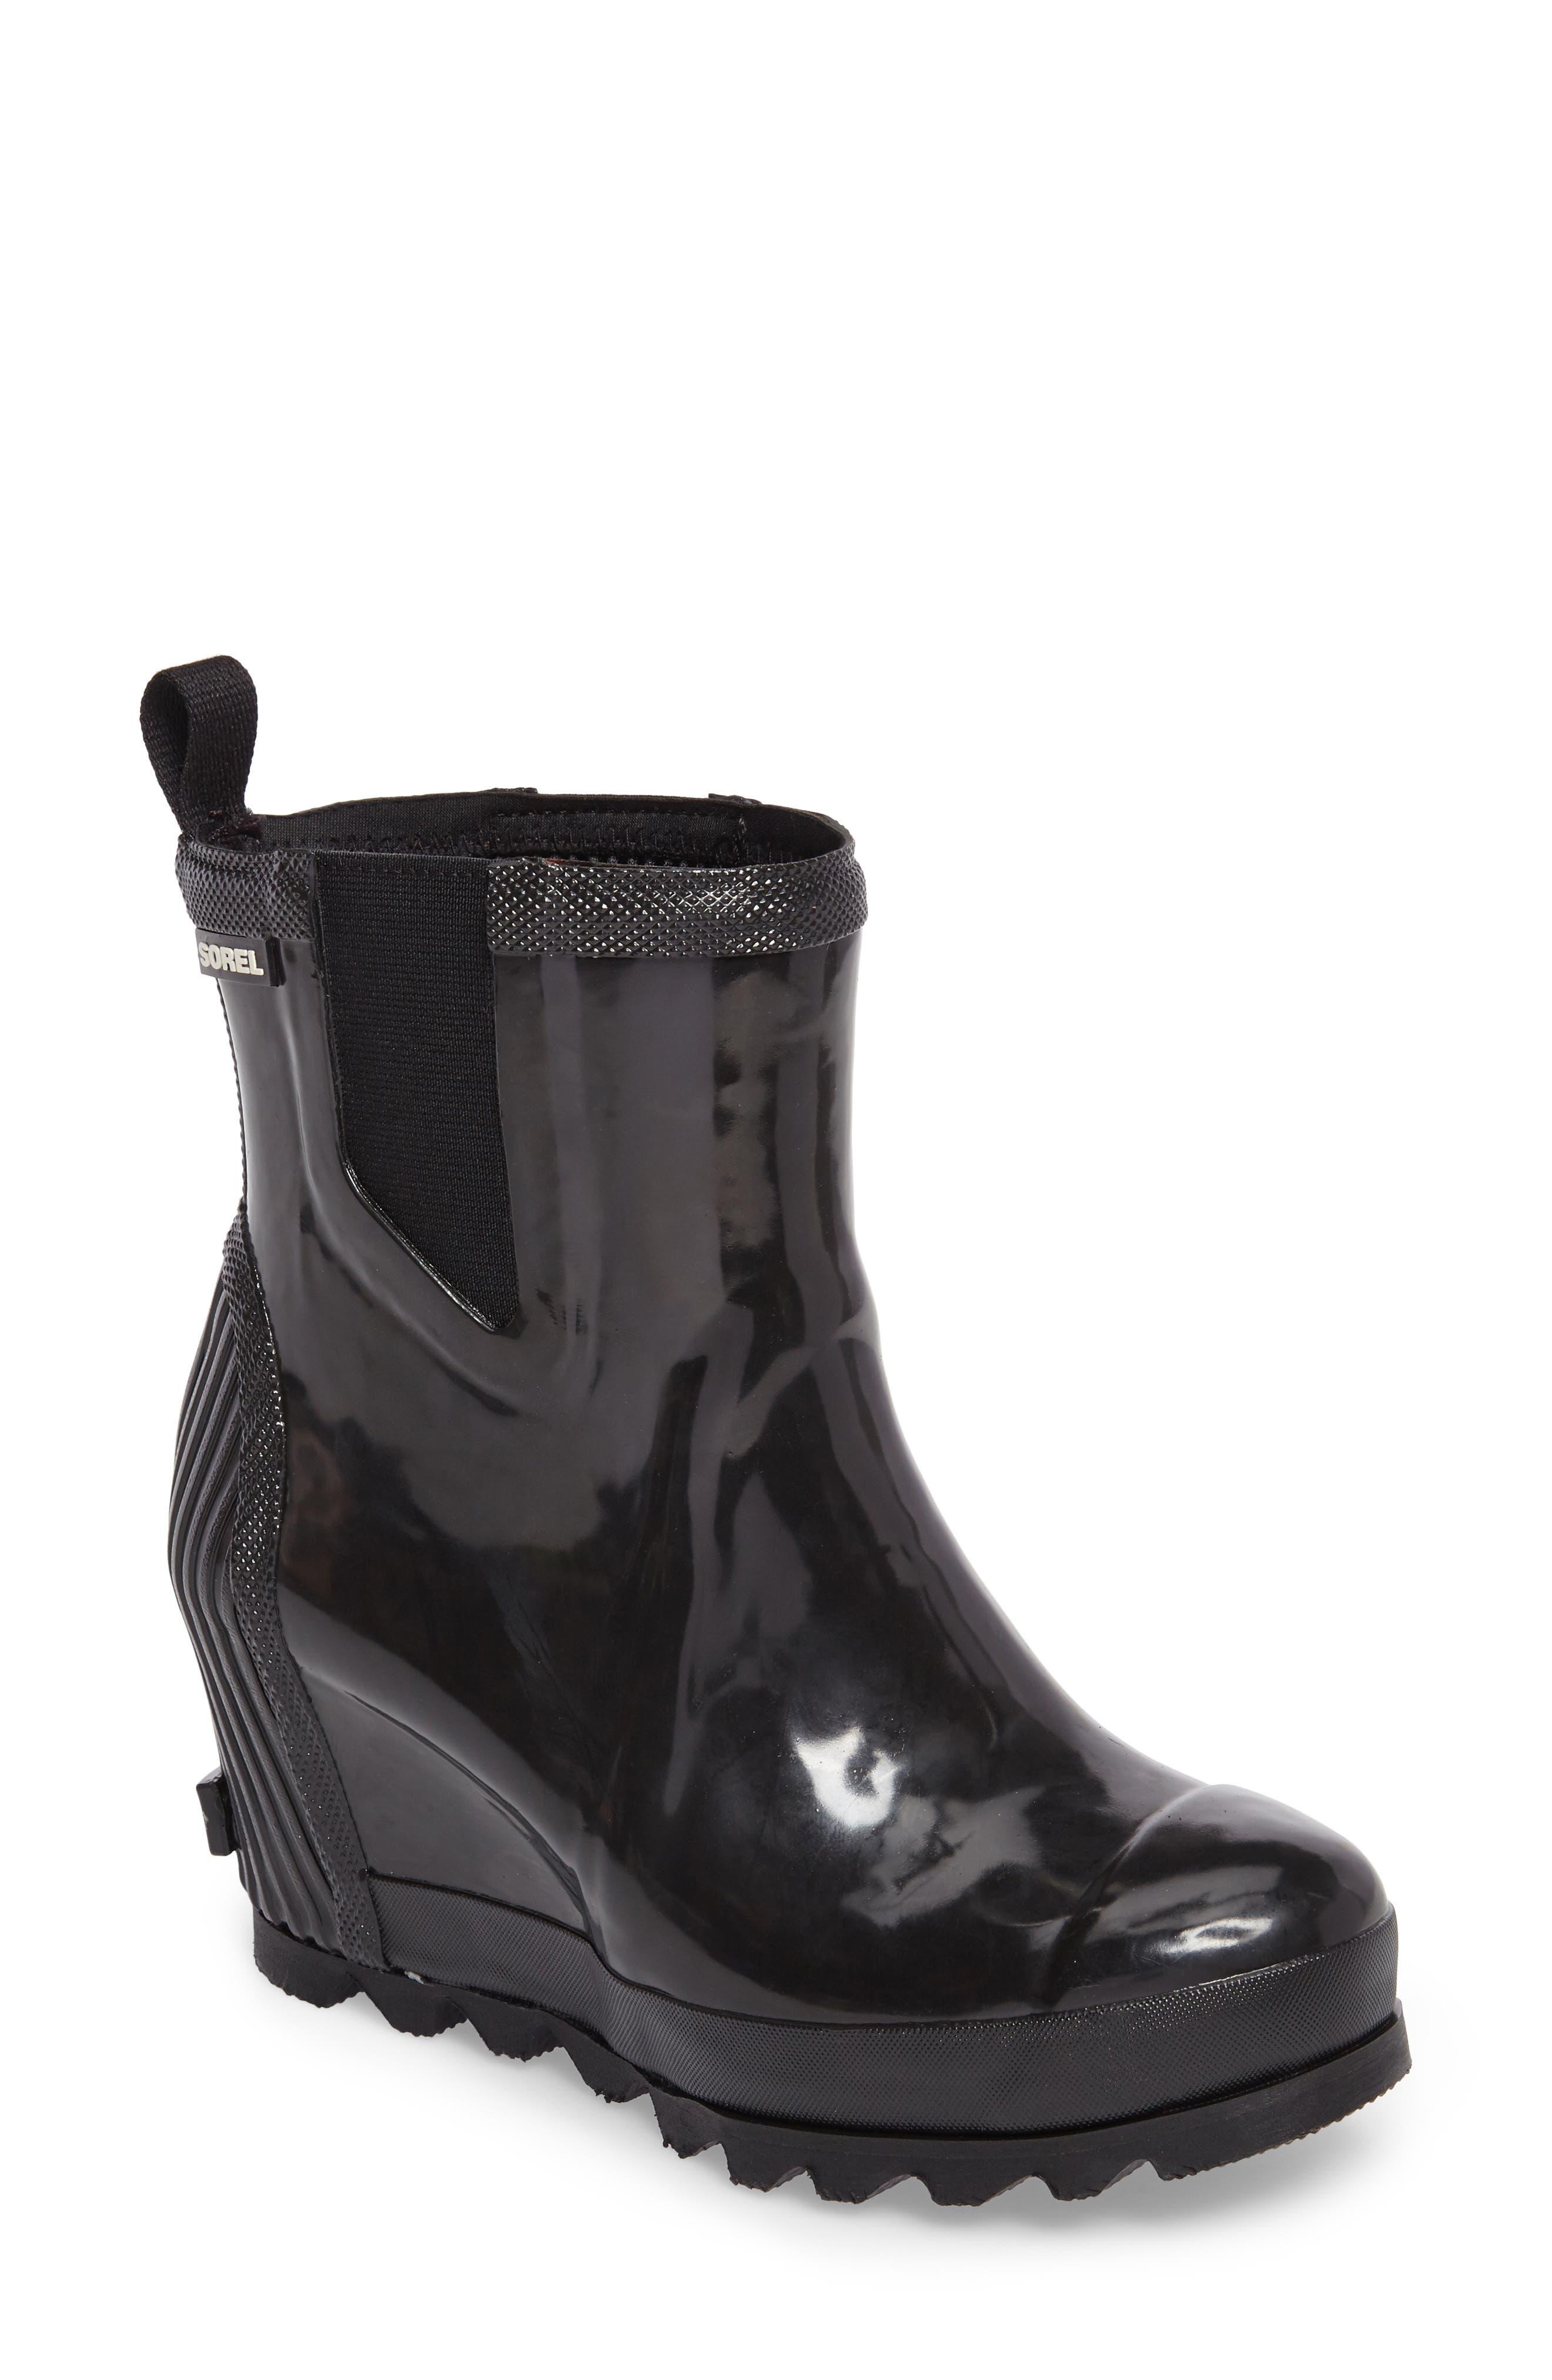 Sorel Joan Glossy Wedge Waterproof Rain Boot, Black